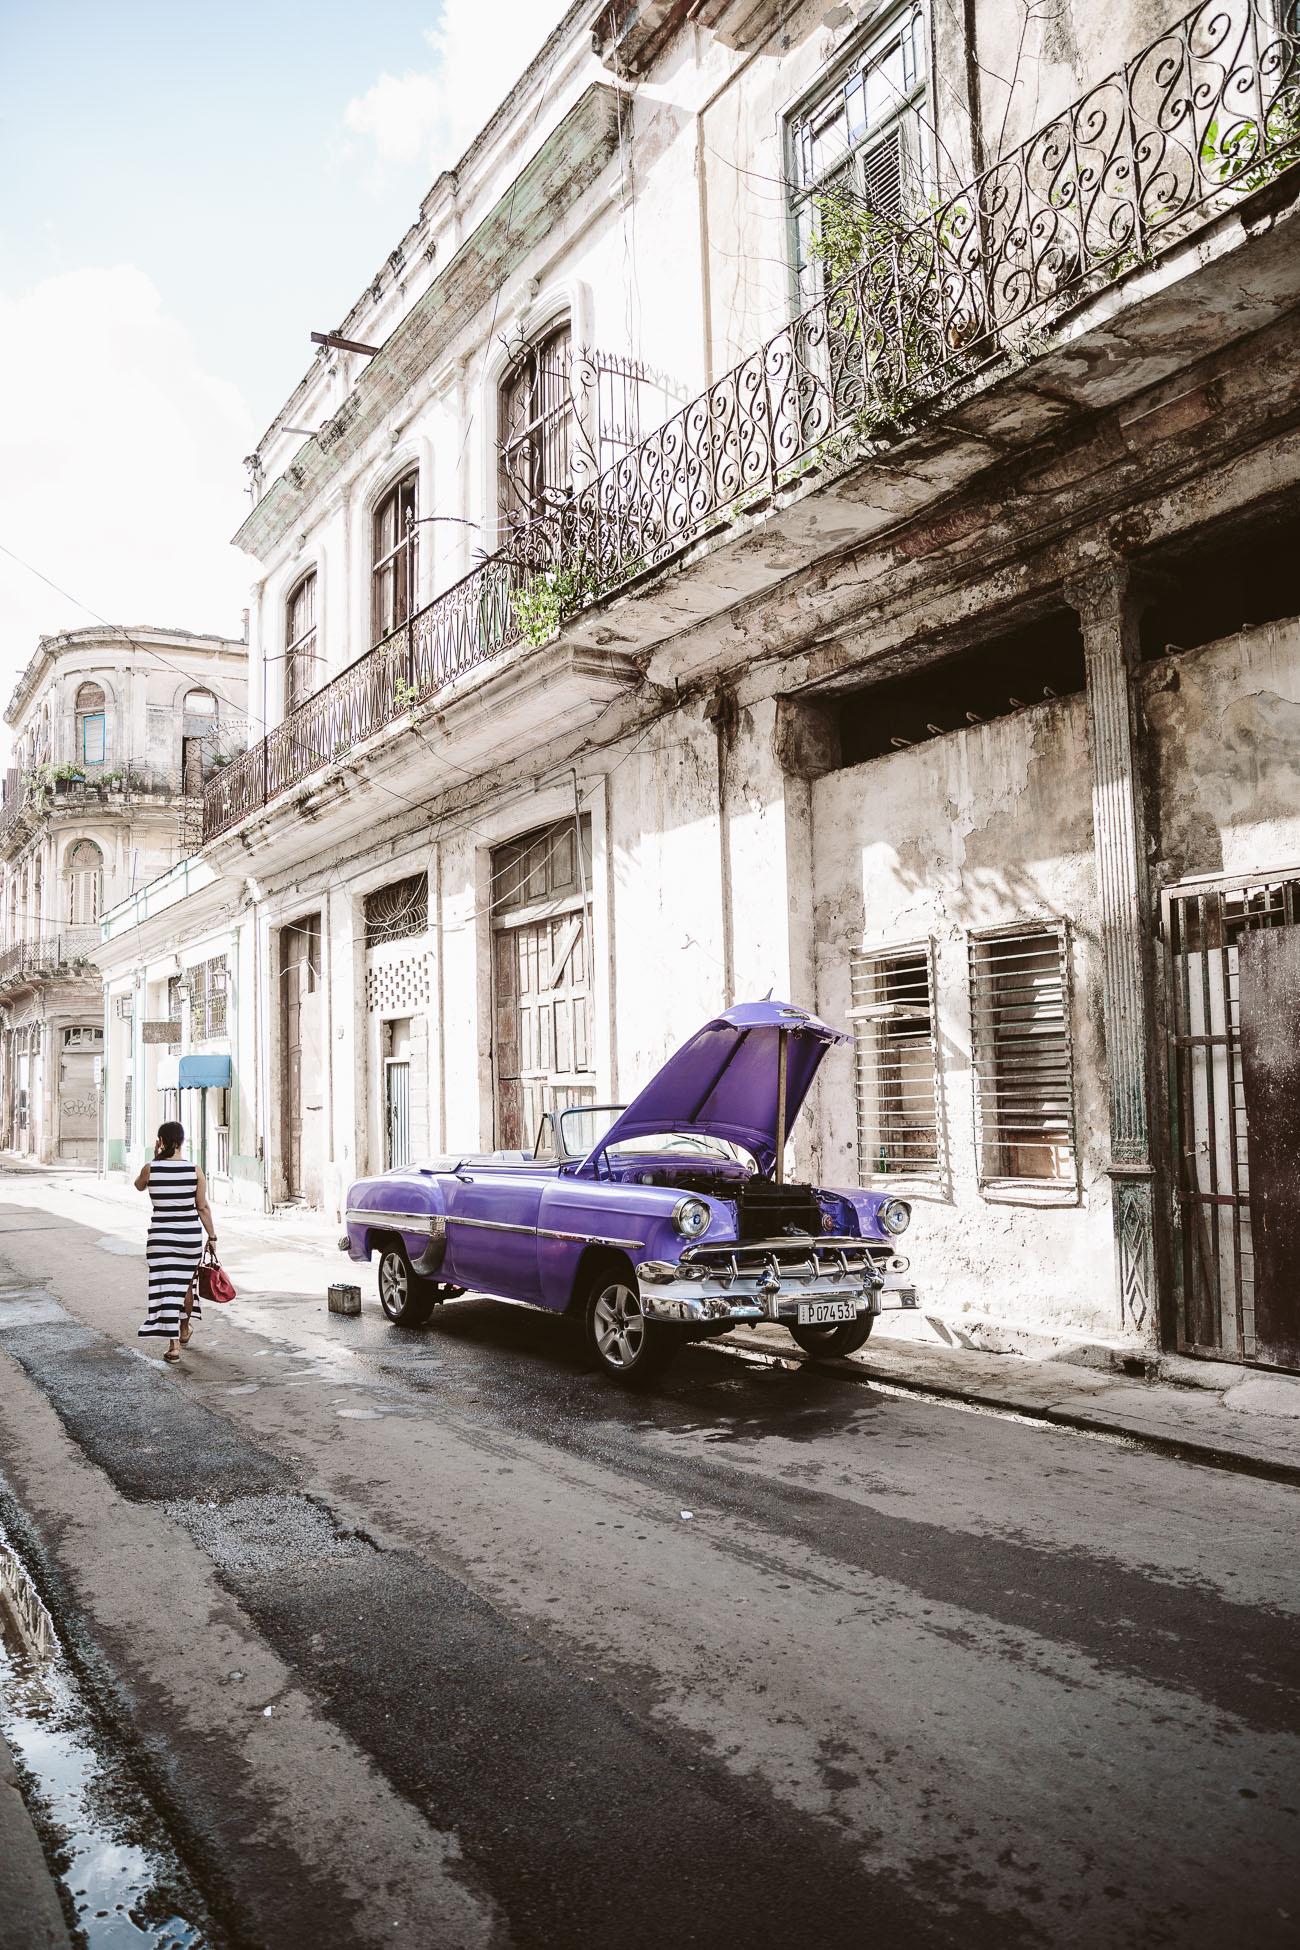 A vintage car in Havana Cuba